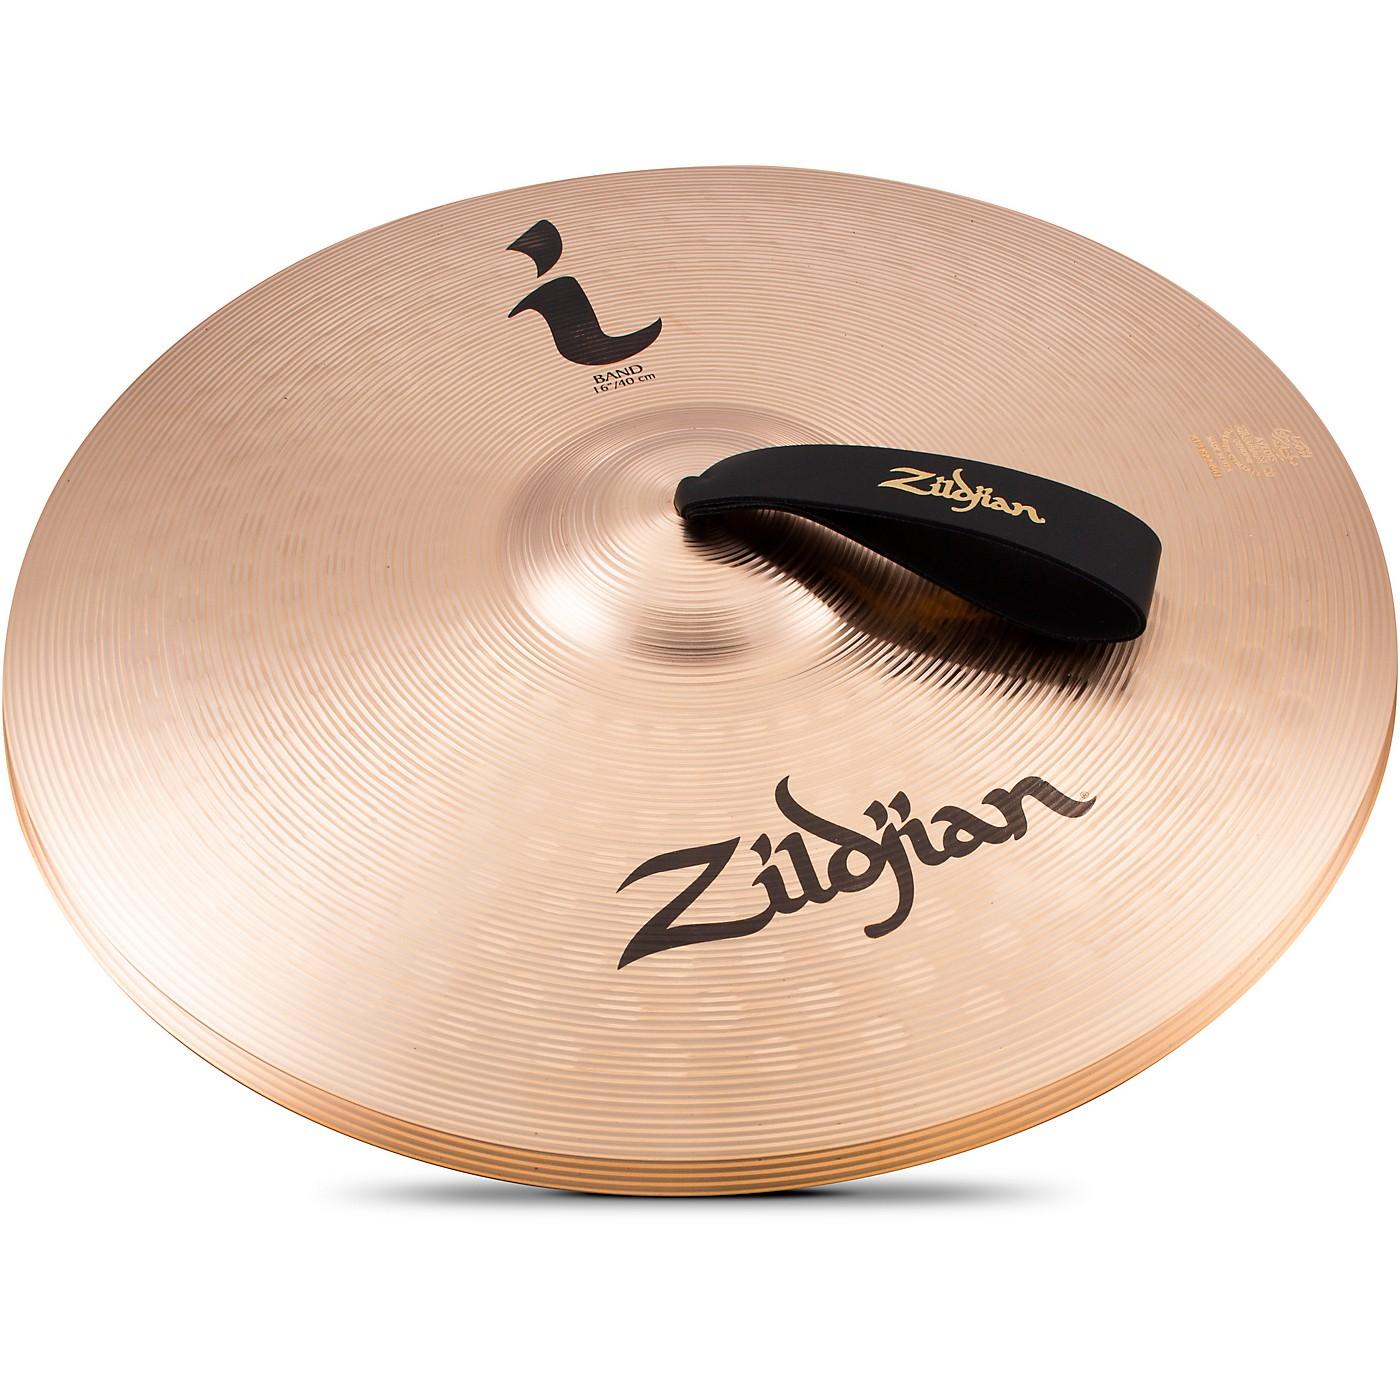 Zildjian I Series Band Cymbals thumbnail